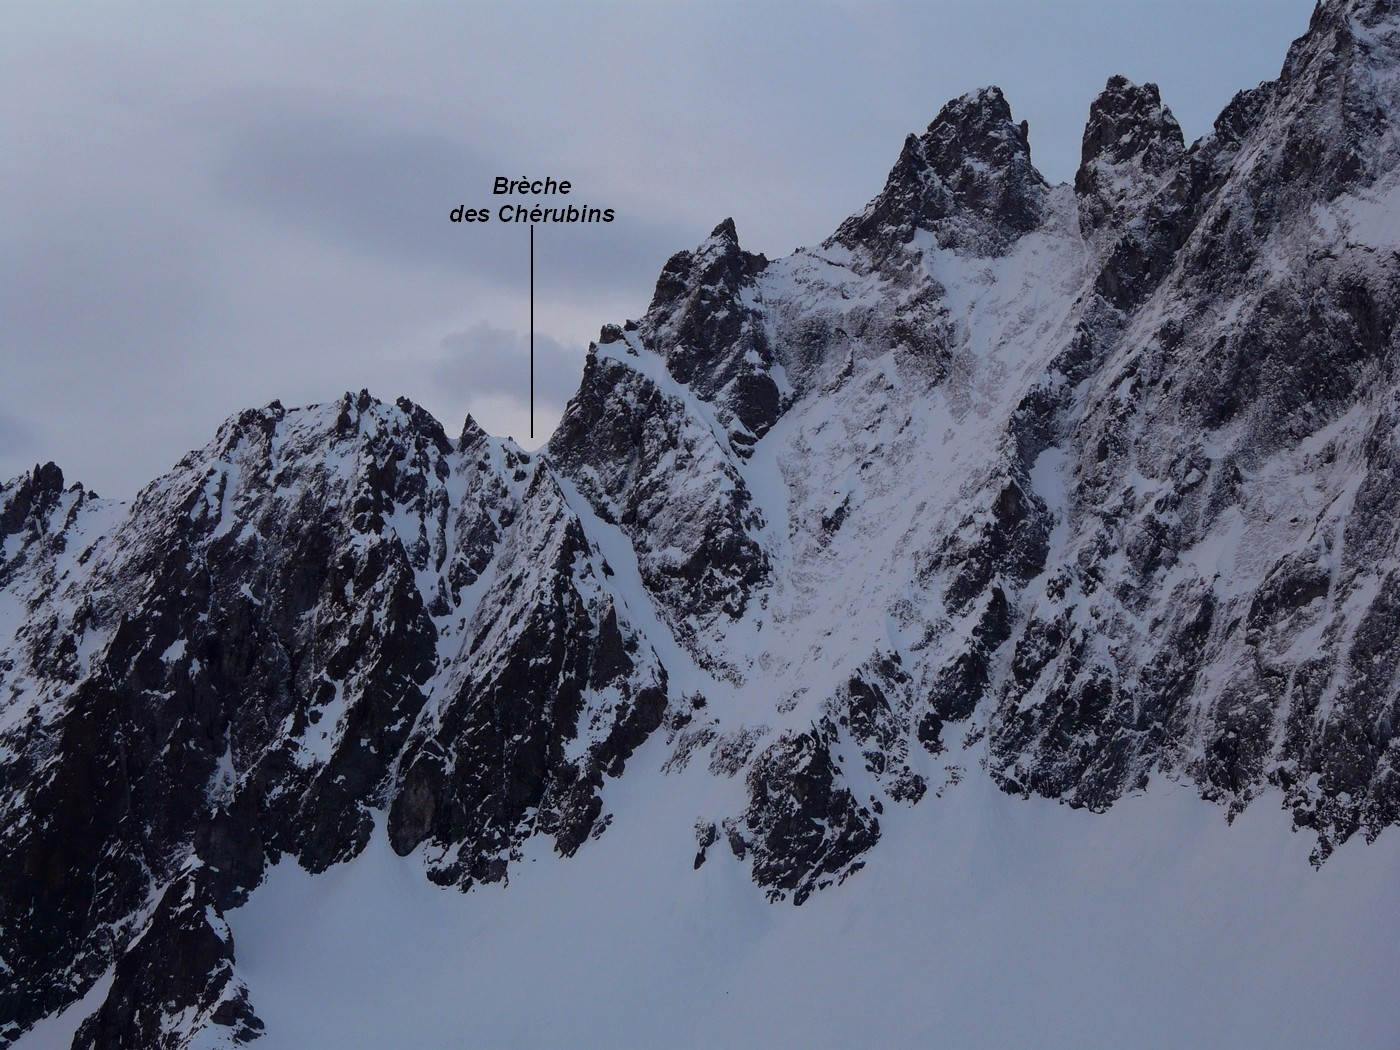 Brèche des Chérubins - versant NW